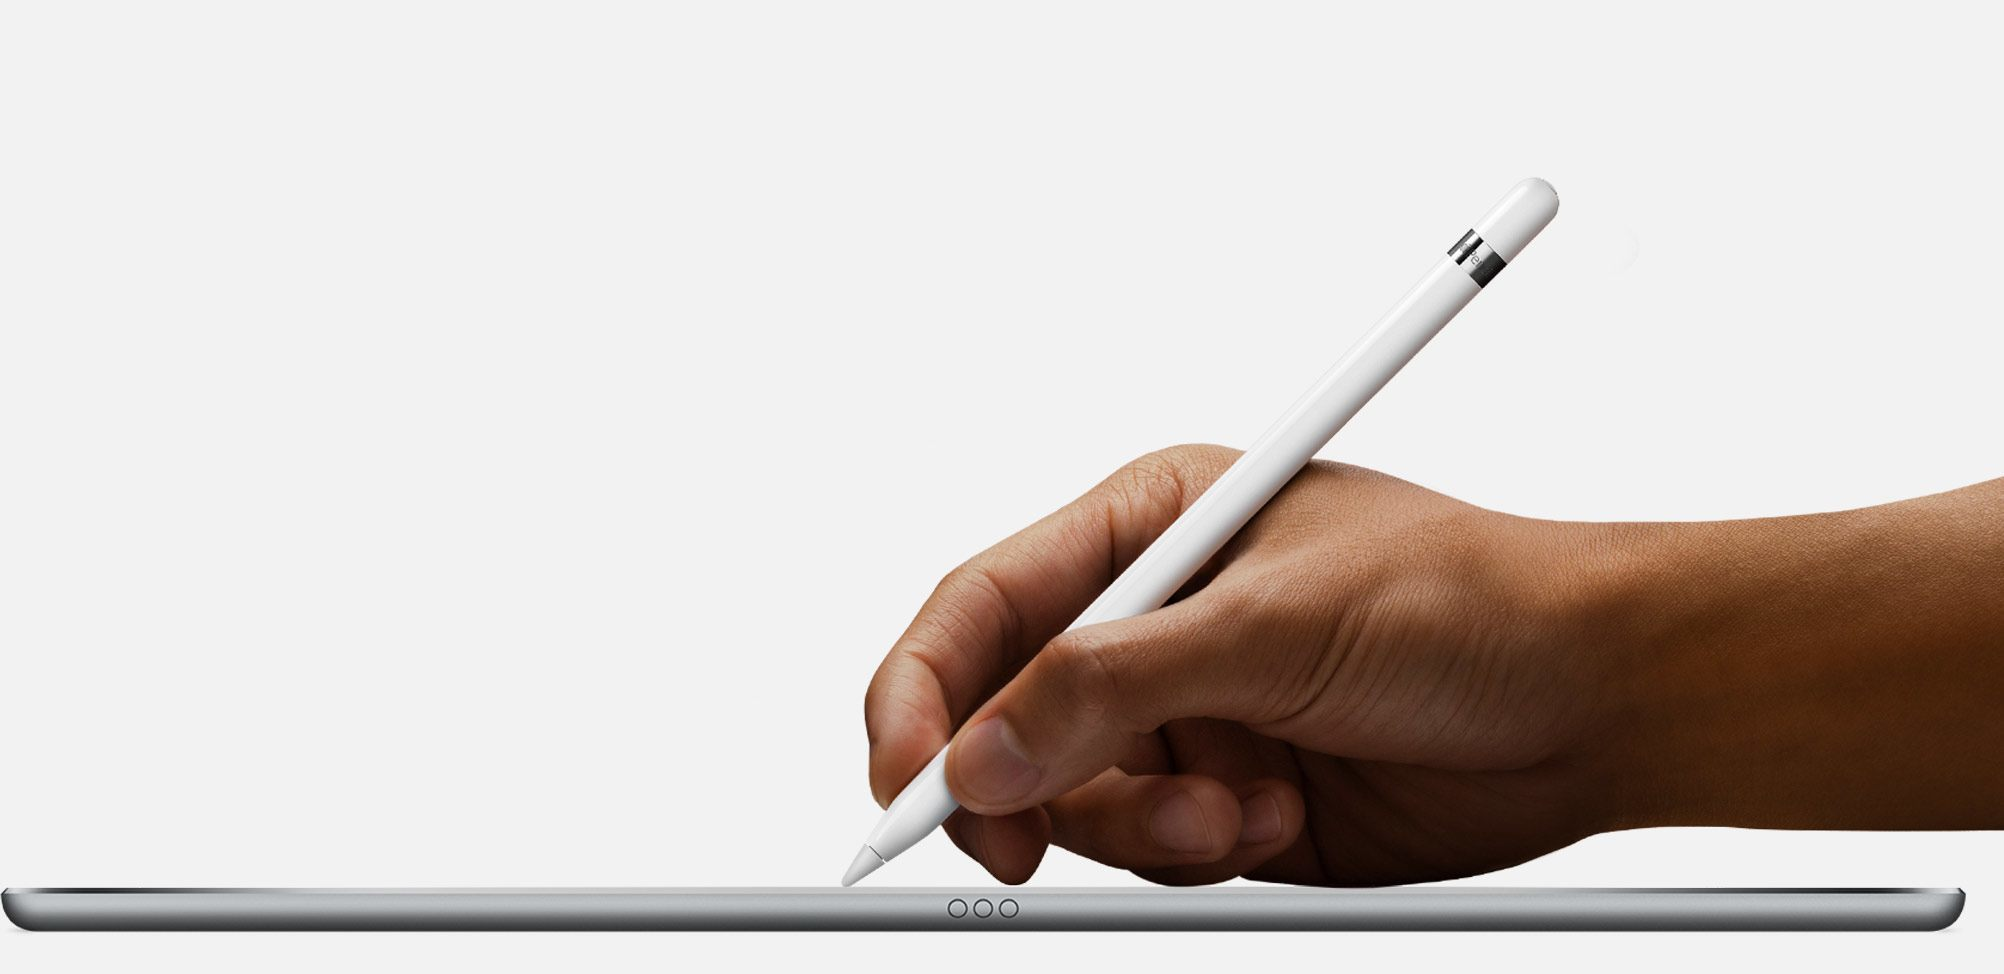 ipad-pro-apple-pencil-090915